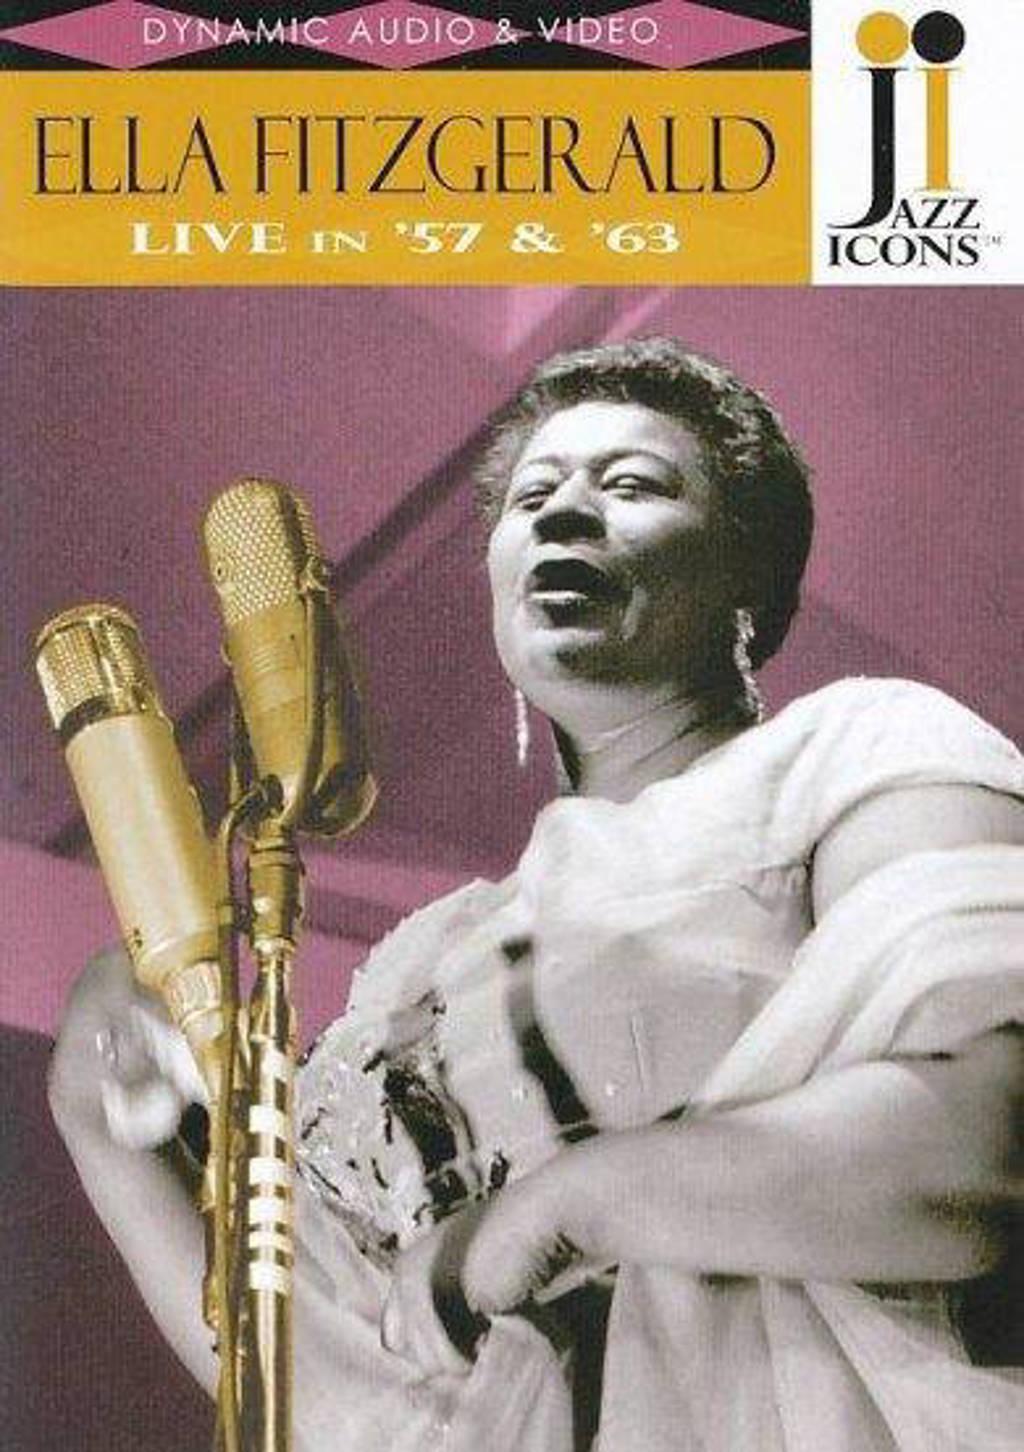 Ella Fitzgerald, Herb Elis, Ray Bro - Ella Fitzgerald Jazz Icons (DVD)